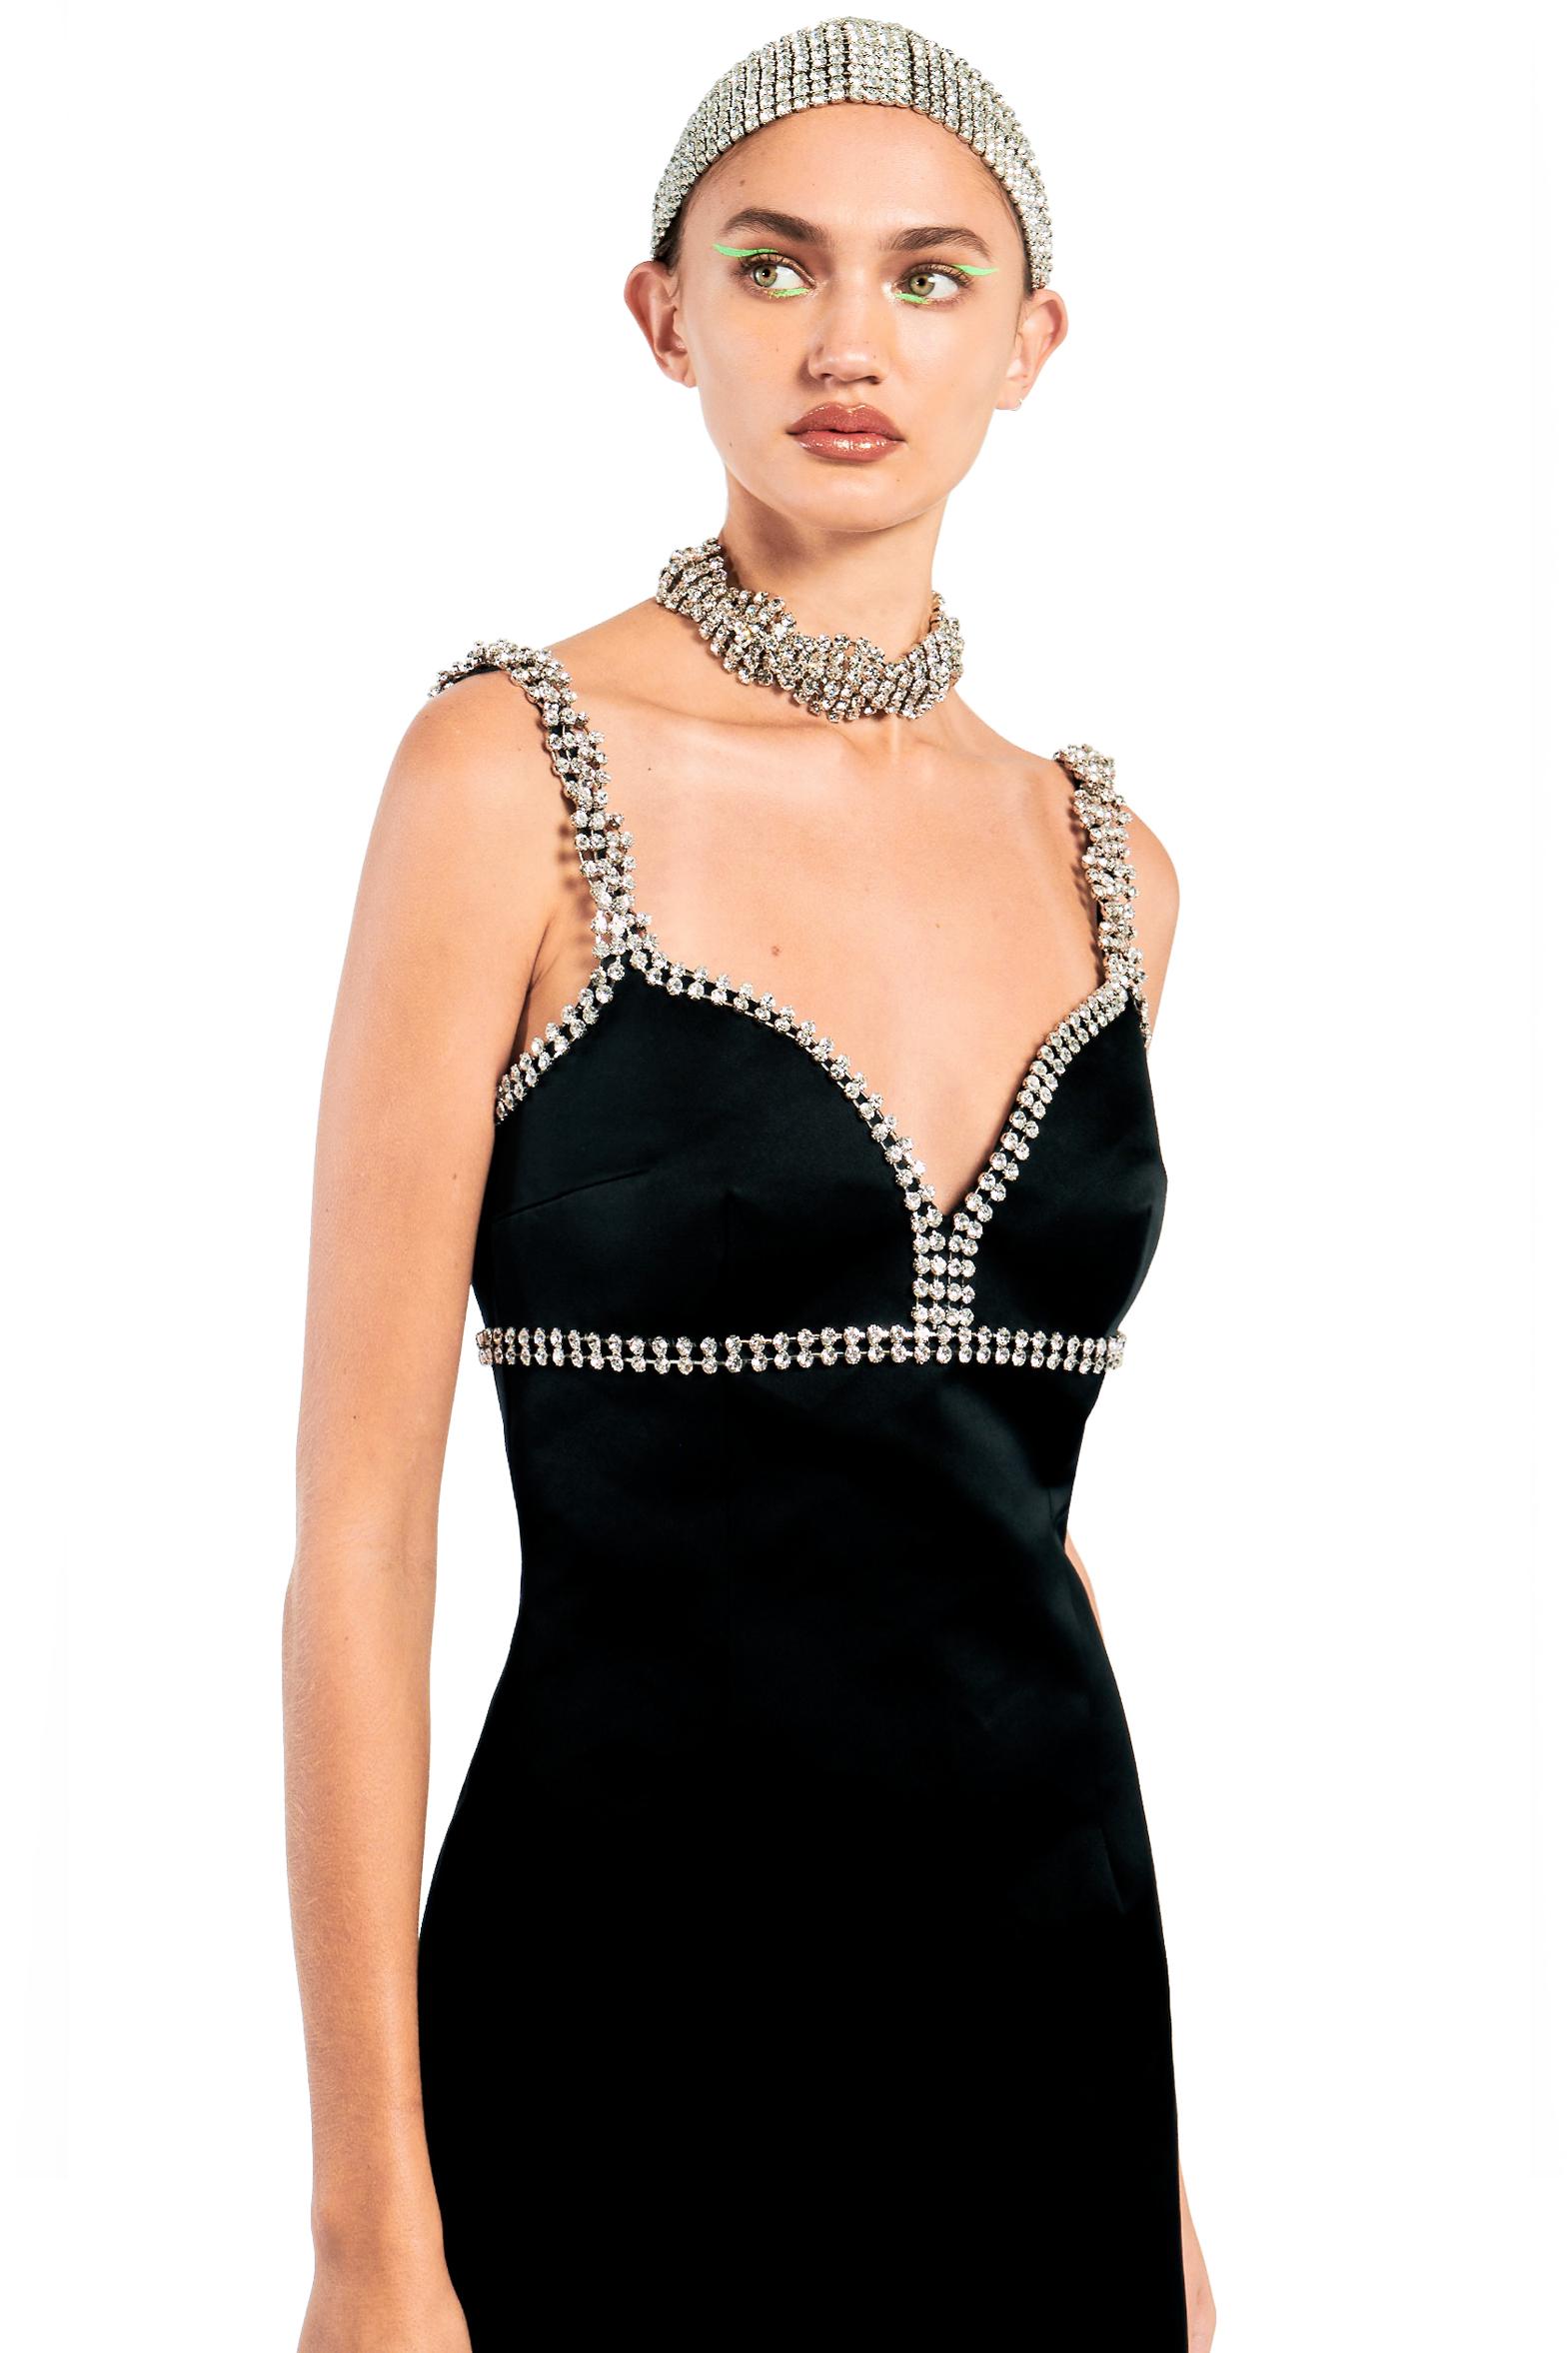 Sweetheart Mini Dress with Braided Crystal Trim